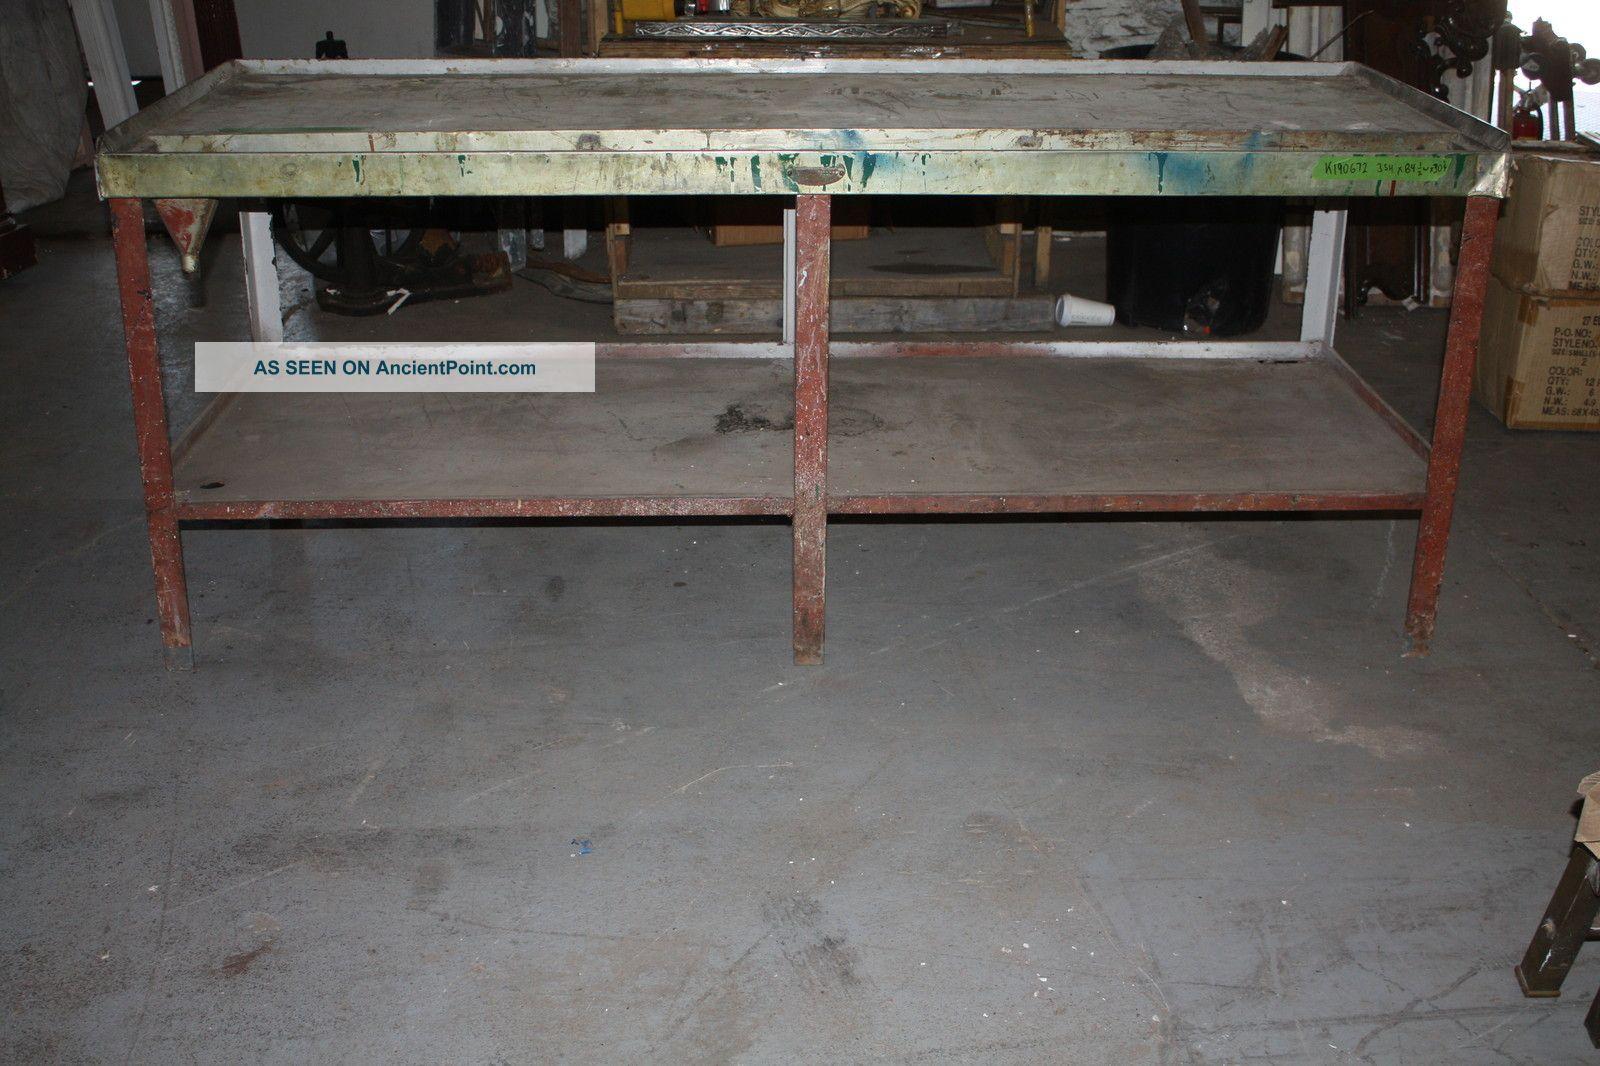 Antique Industrial Work Bench Sink - Monel Or Stainless Steel Top ...